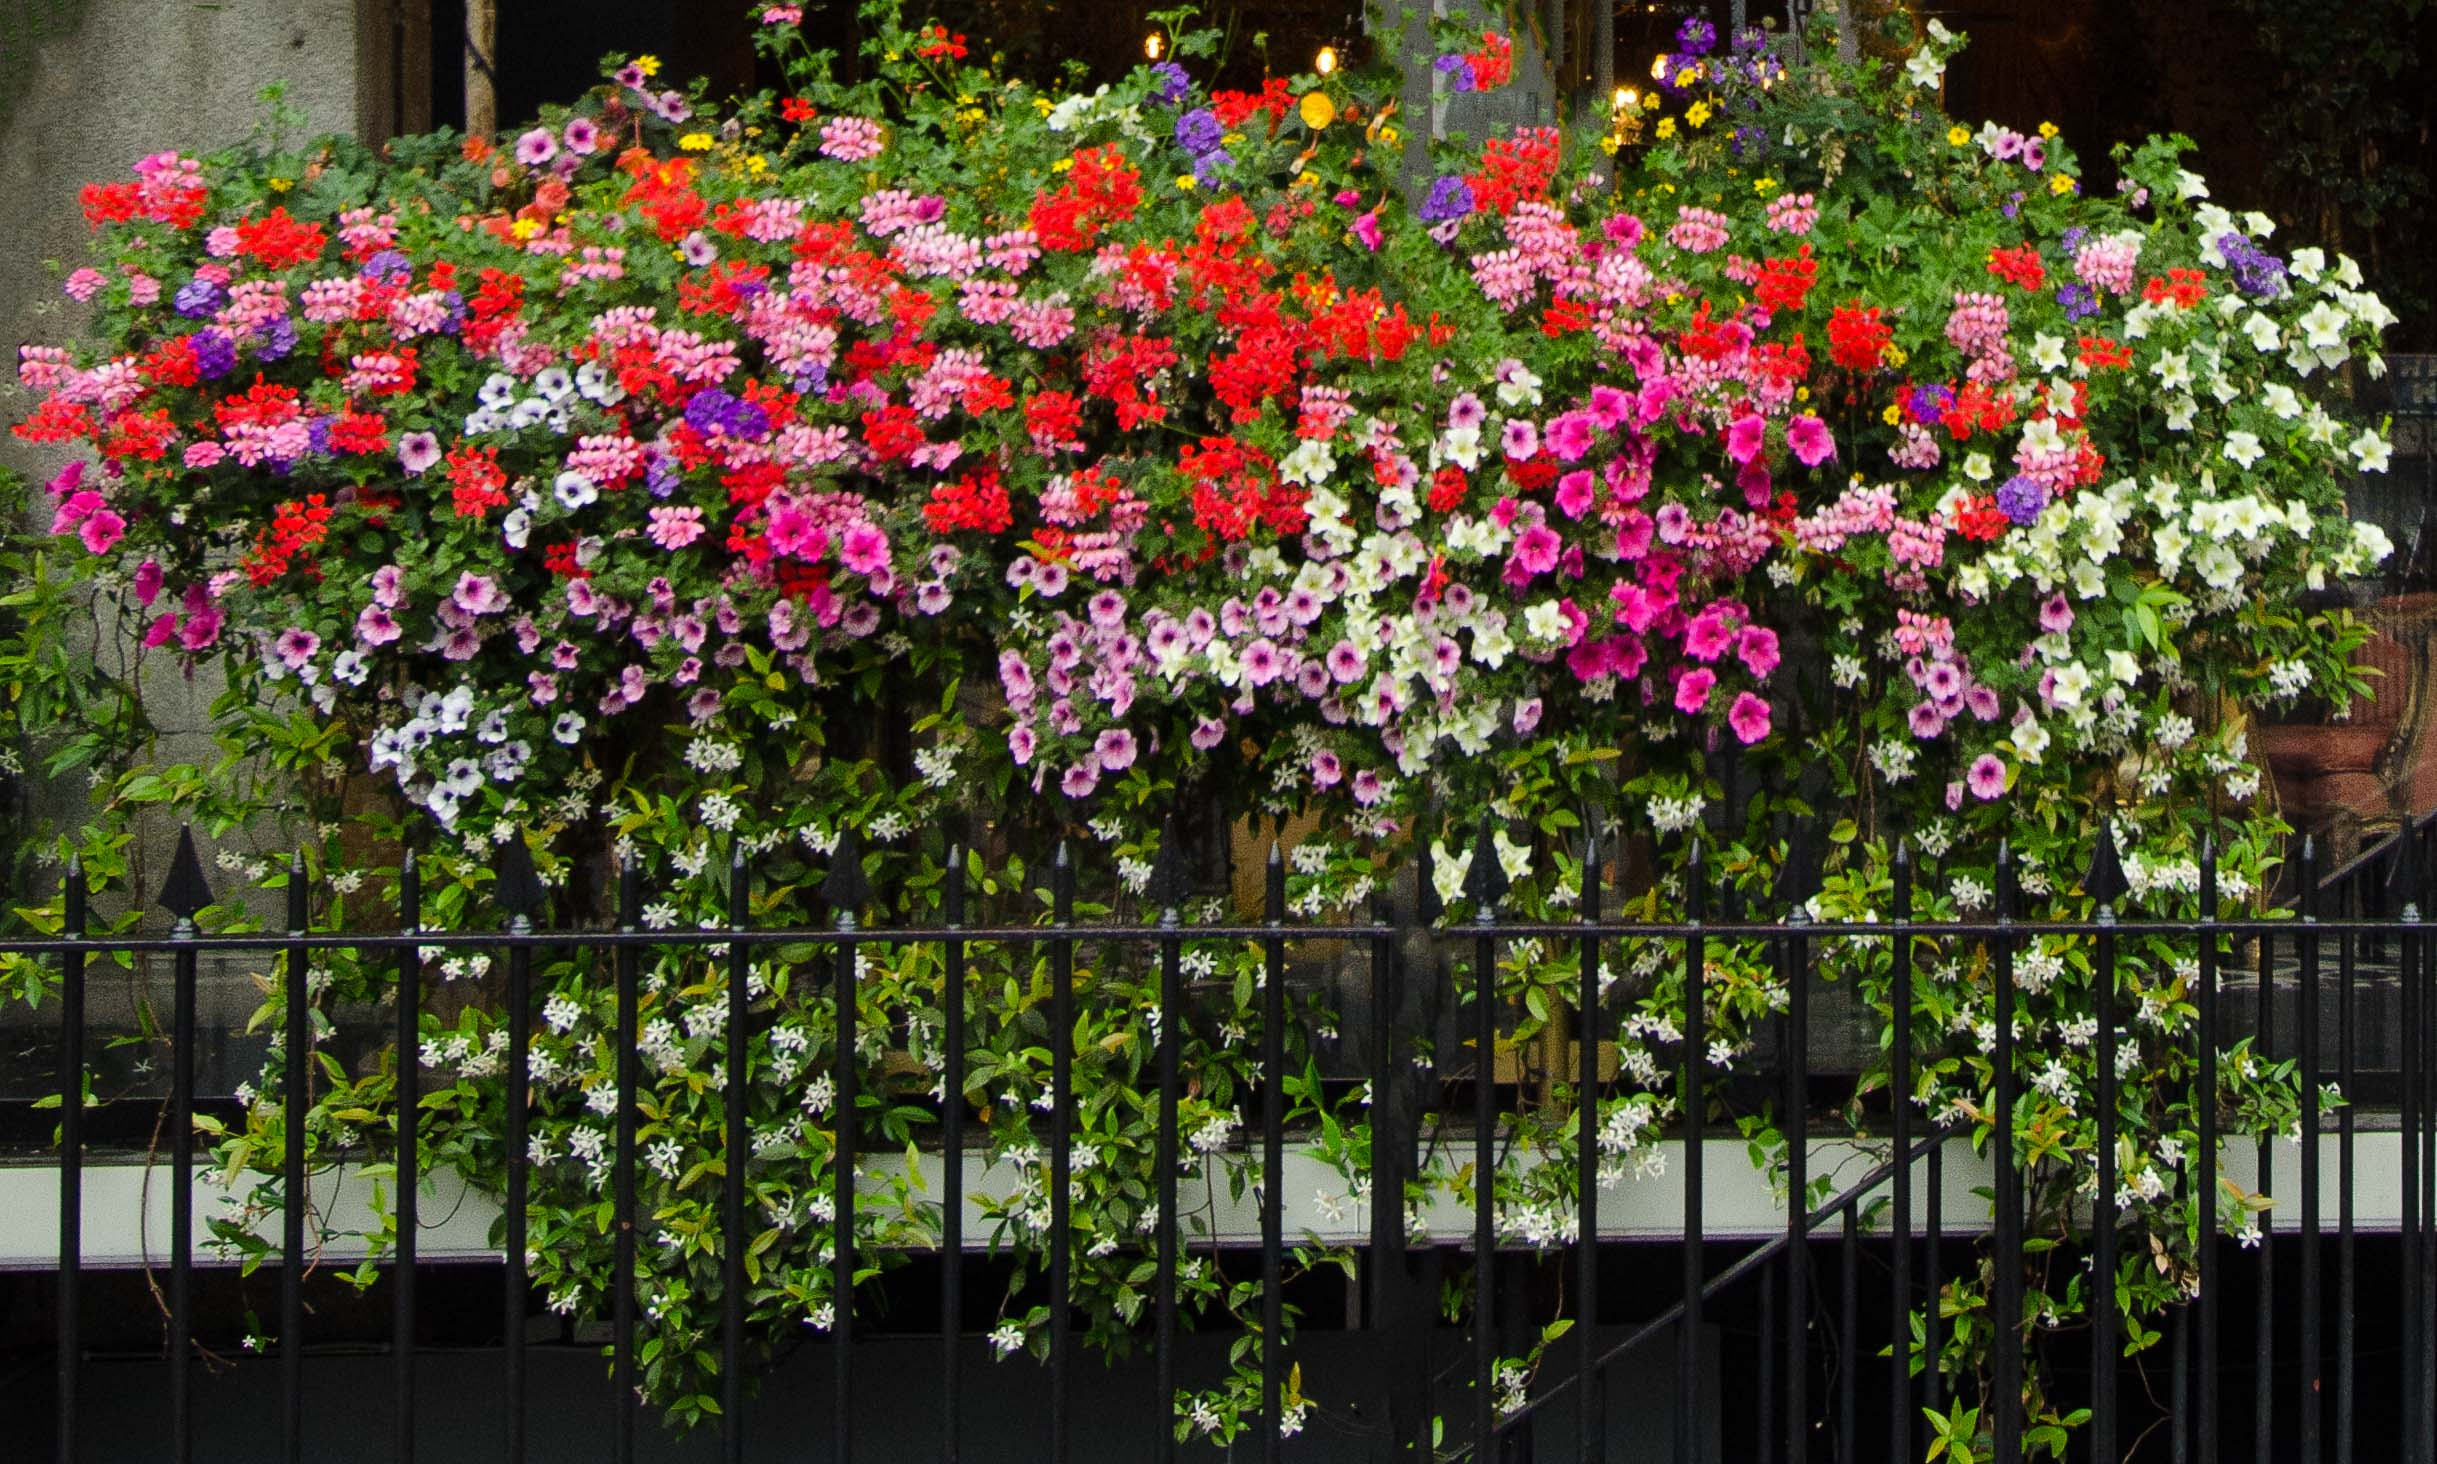 Dublin, Ireland 2015